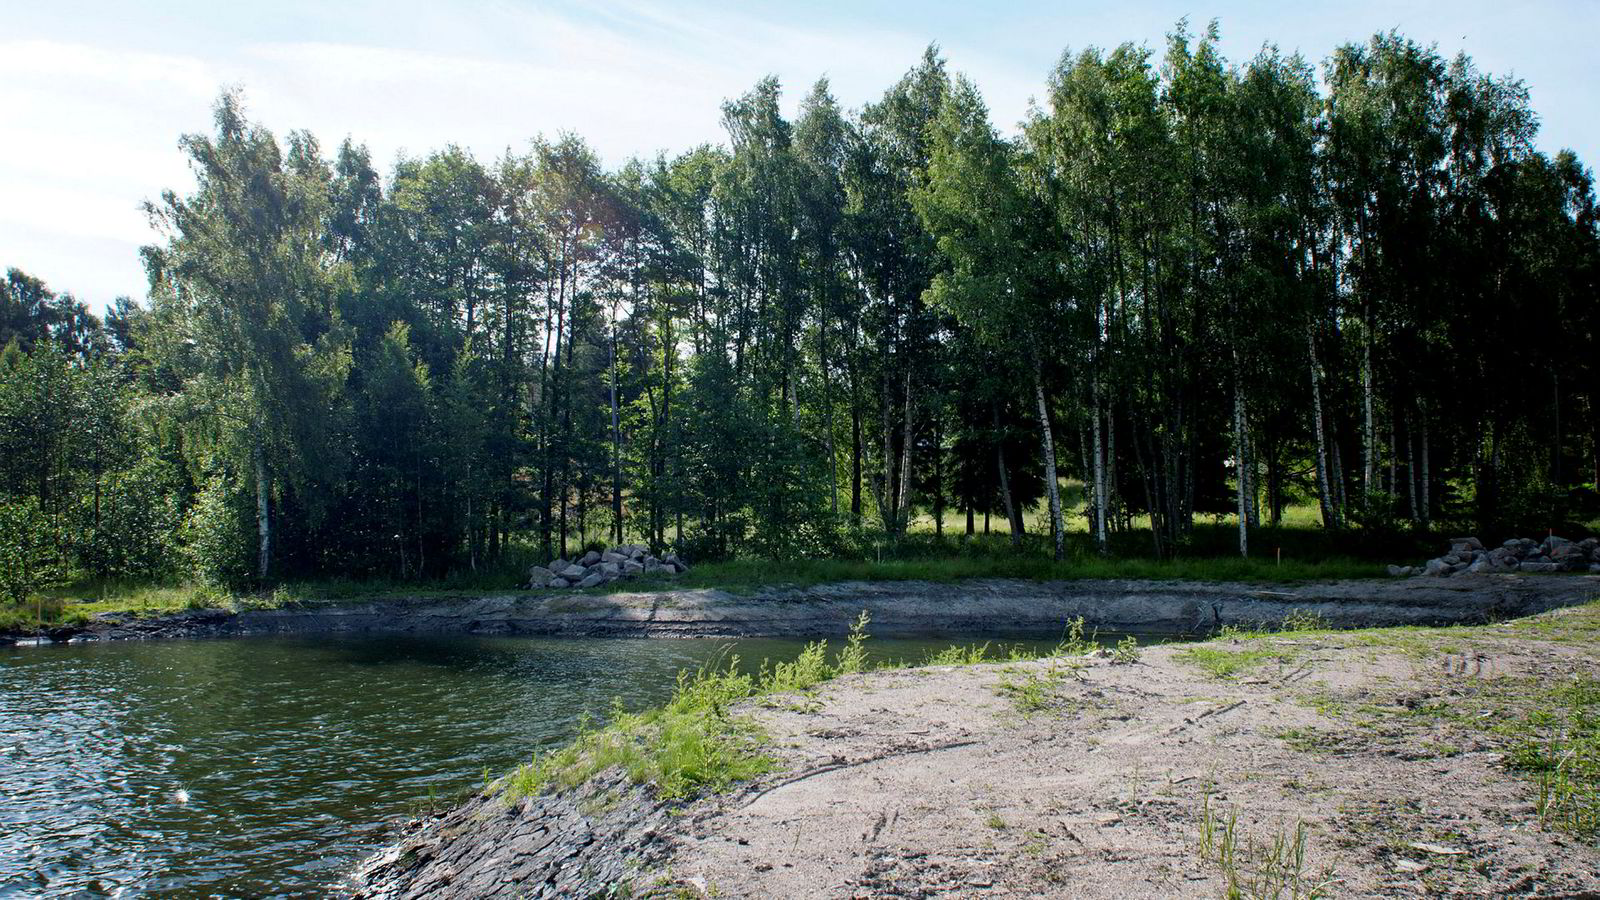 Etter en lang strid om hytteutbygging i Hankø-skjærgården på østsiden av Oslofjorden, avviser Advokatforeningens disiplinærutvalg klage mot advokat Rasmus Asbjørnsen.